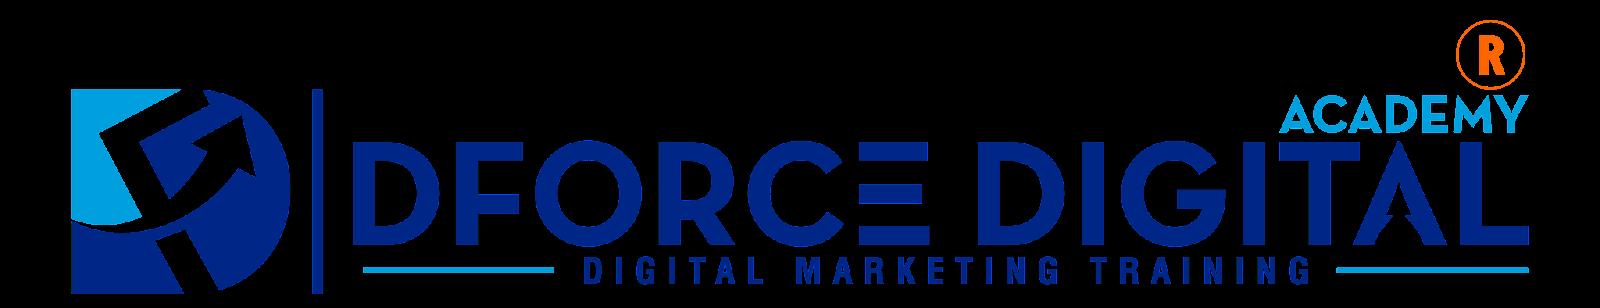 Top 5 Digital Marketing Institutes in Amritsar